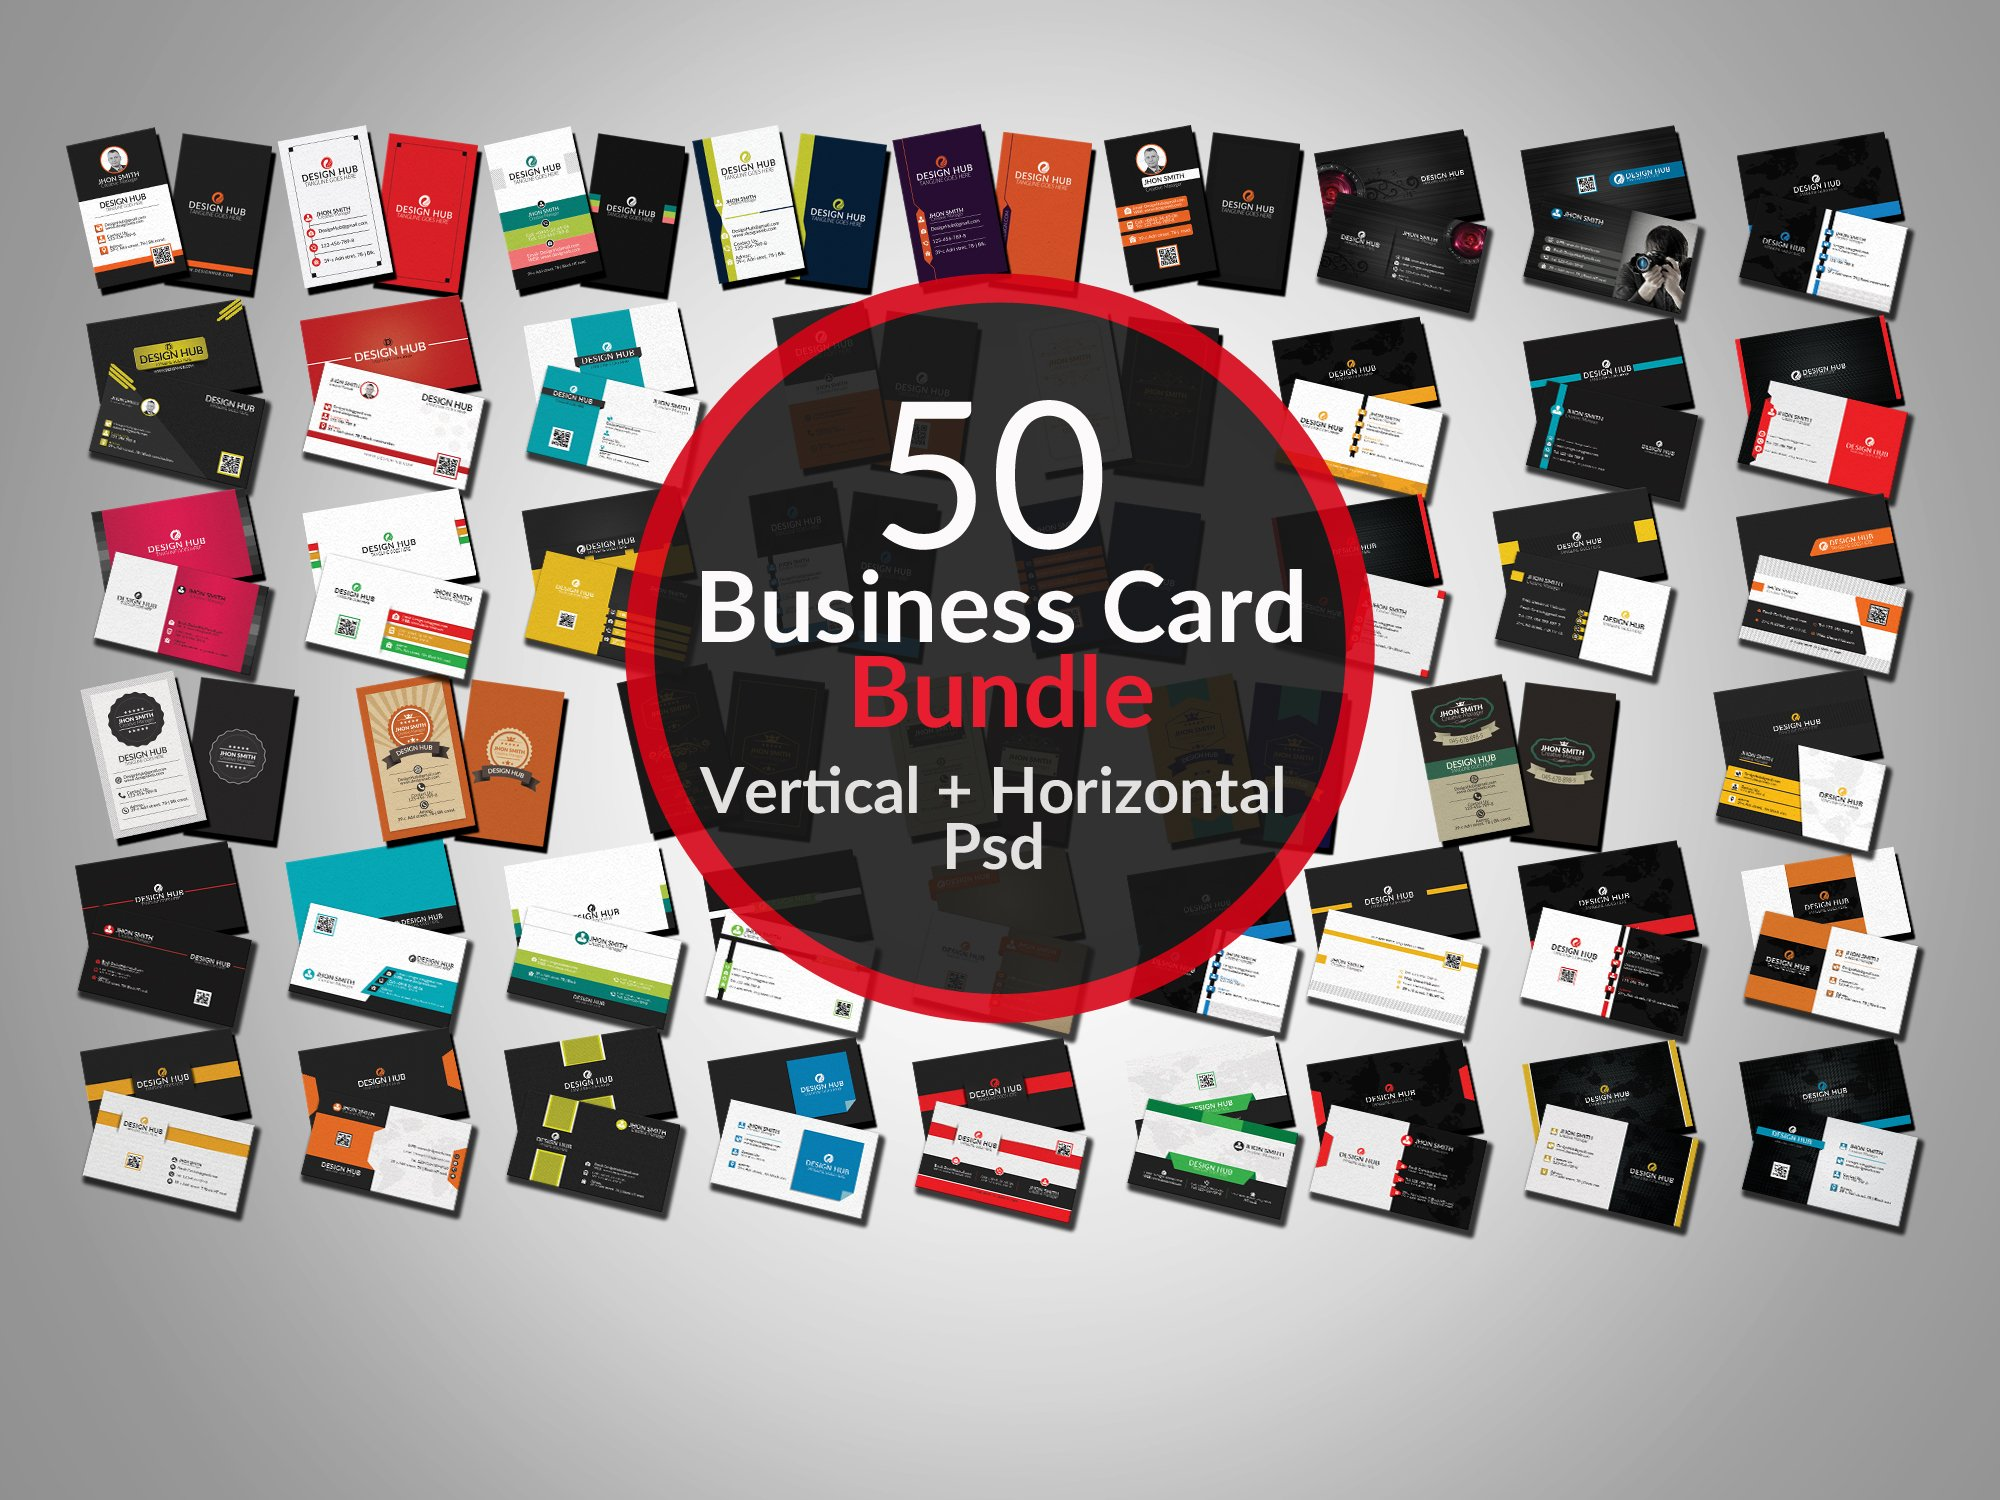 50 corporate business card bundle business card templates 50 corporate business card bundle business card templates creative market colourmoves